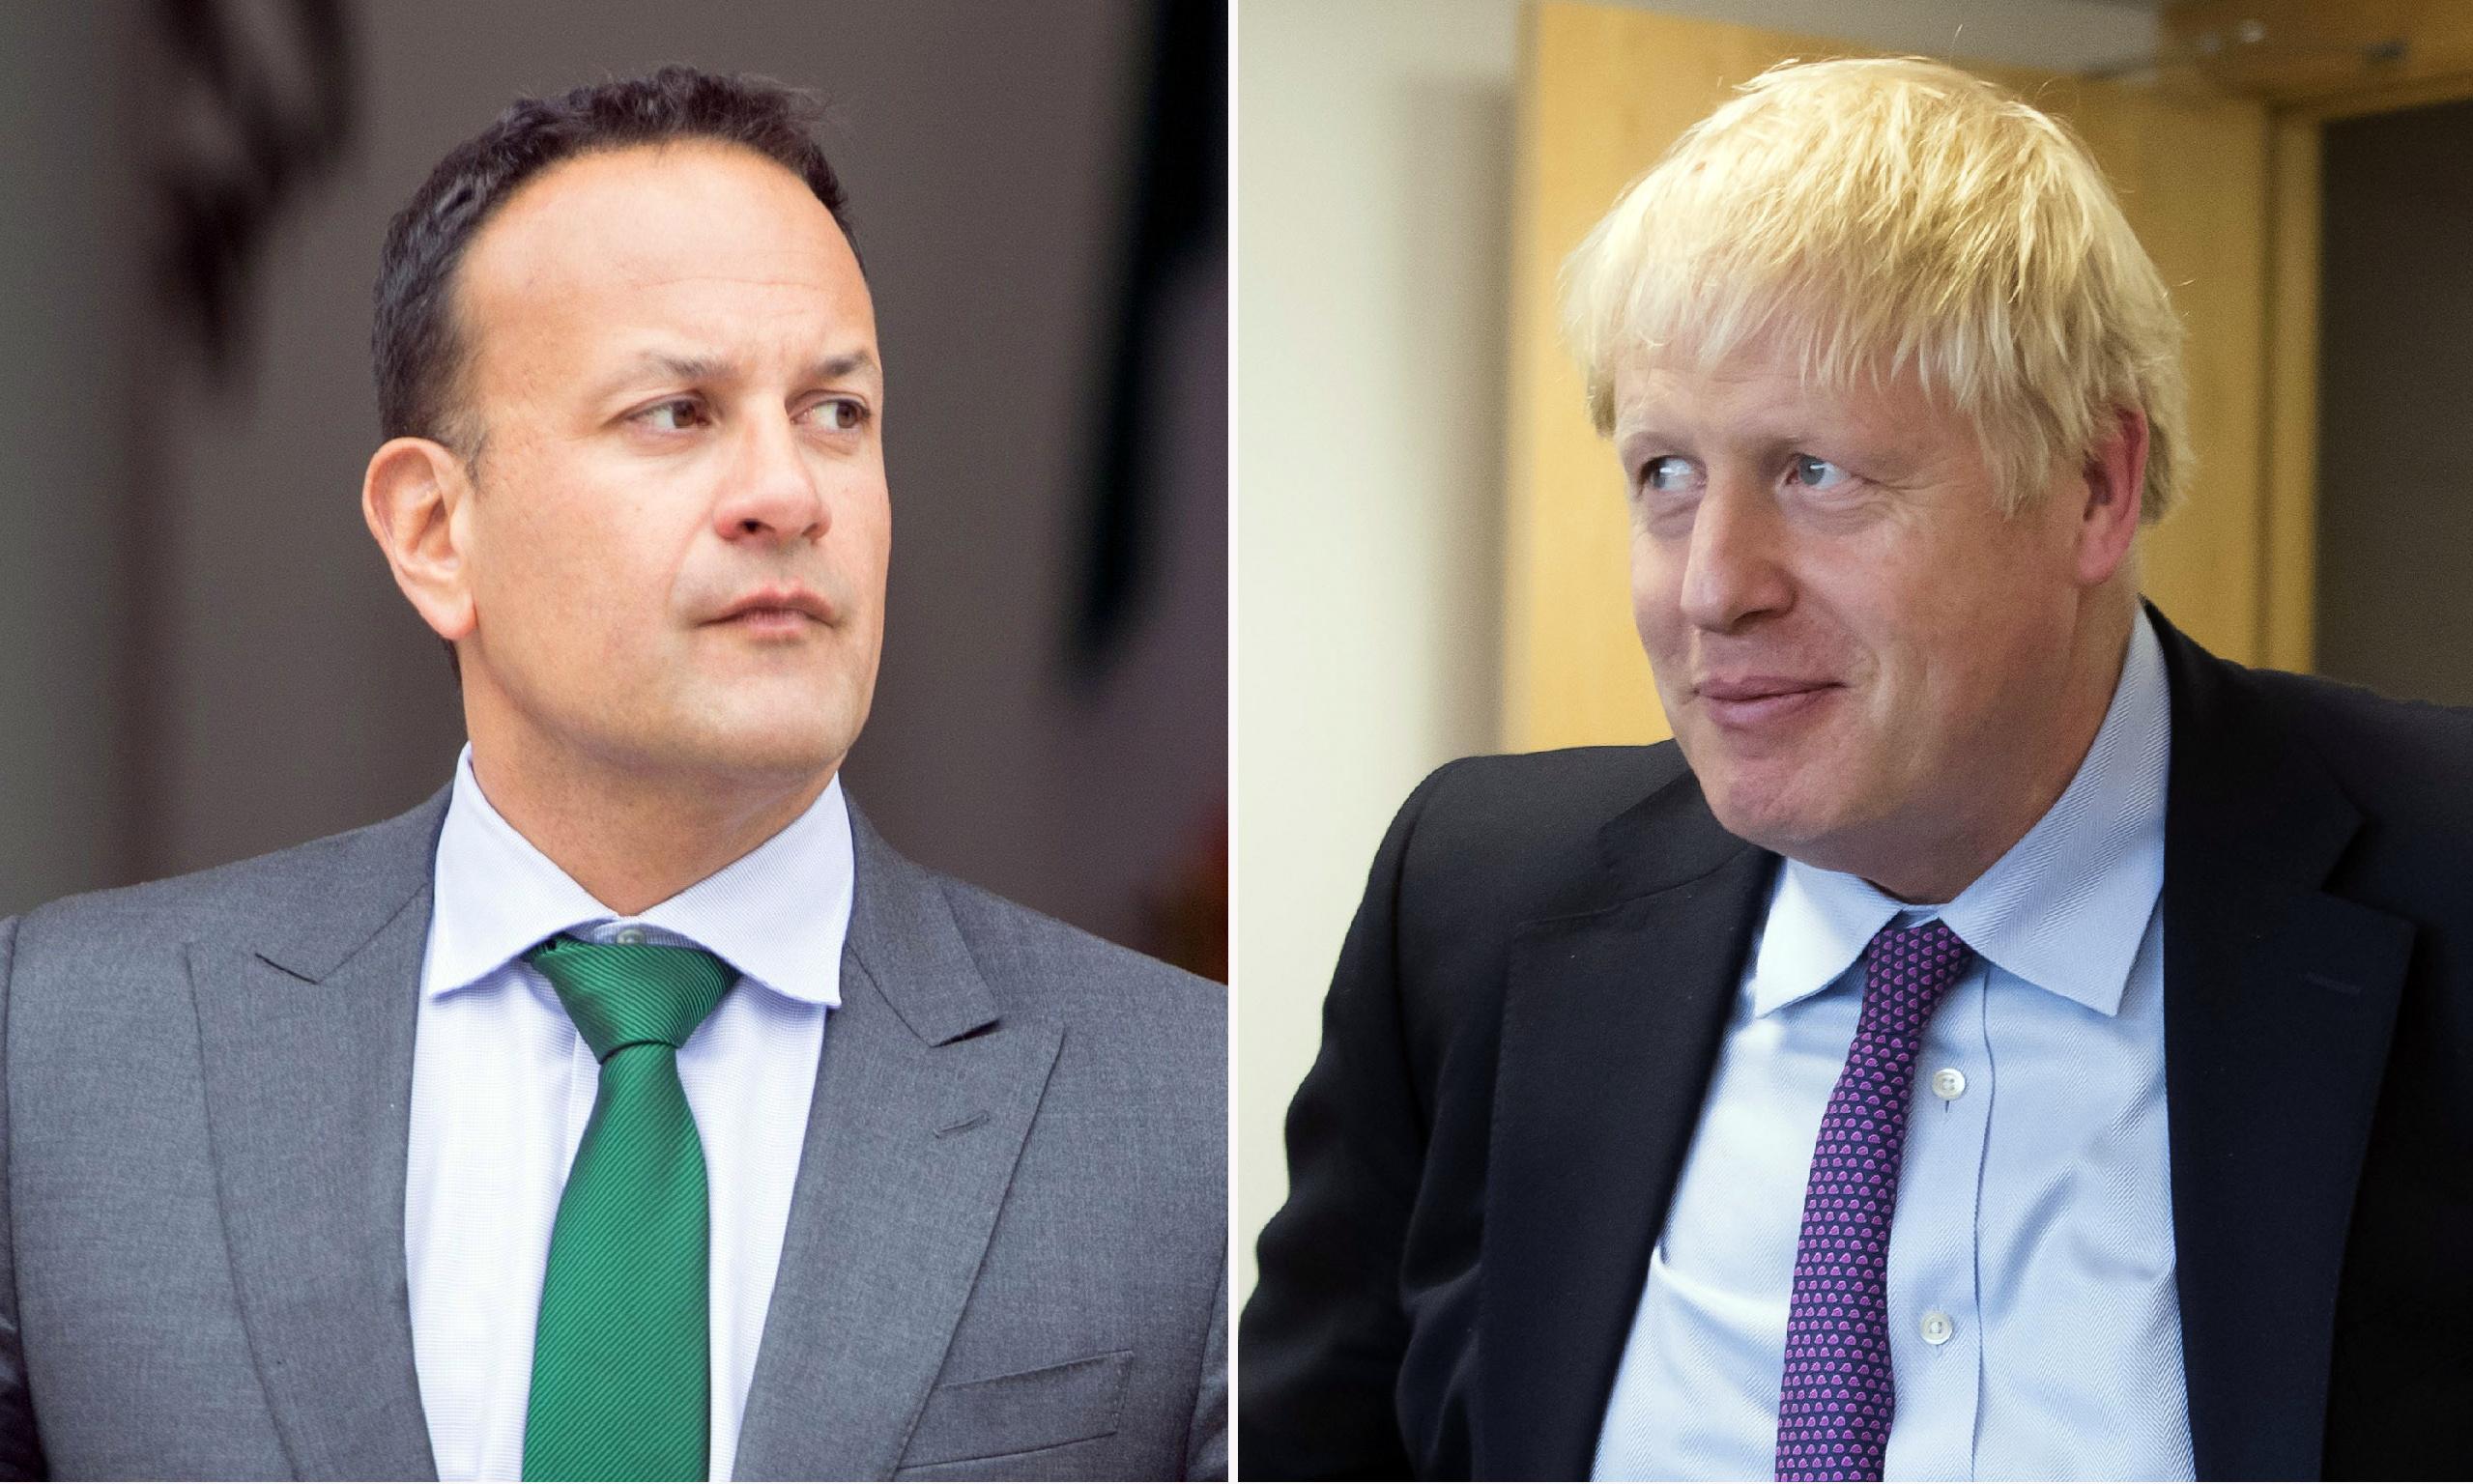 Boris Johnson: EU must scrap the backstop to avoid a no-deal Brexit